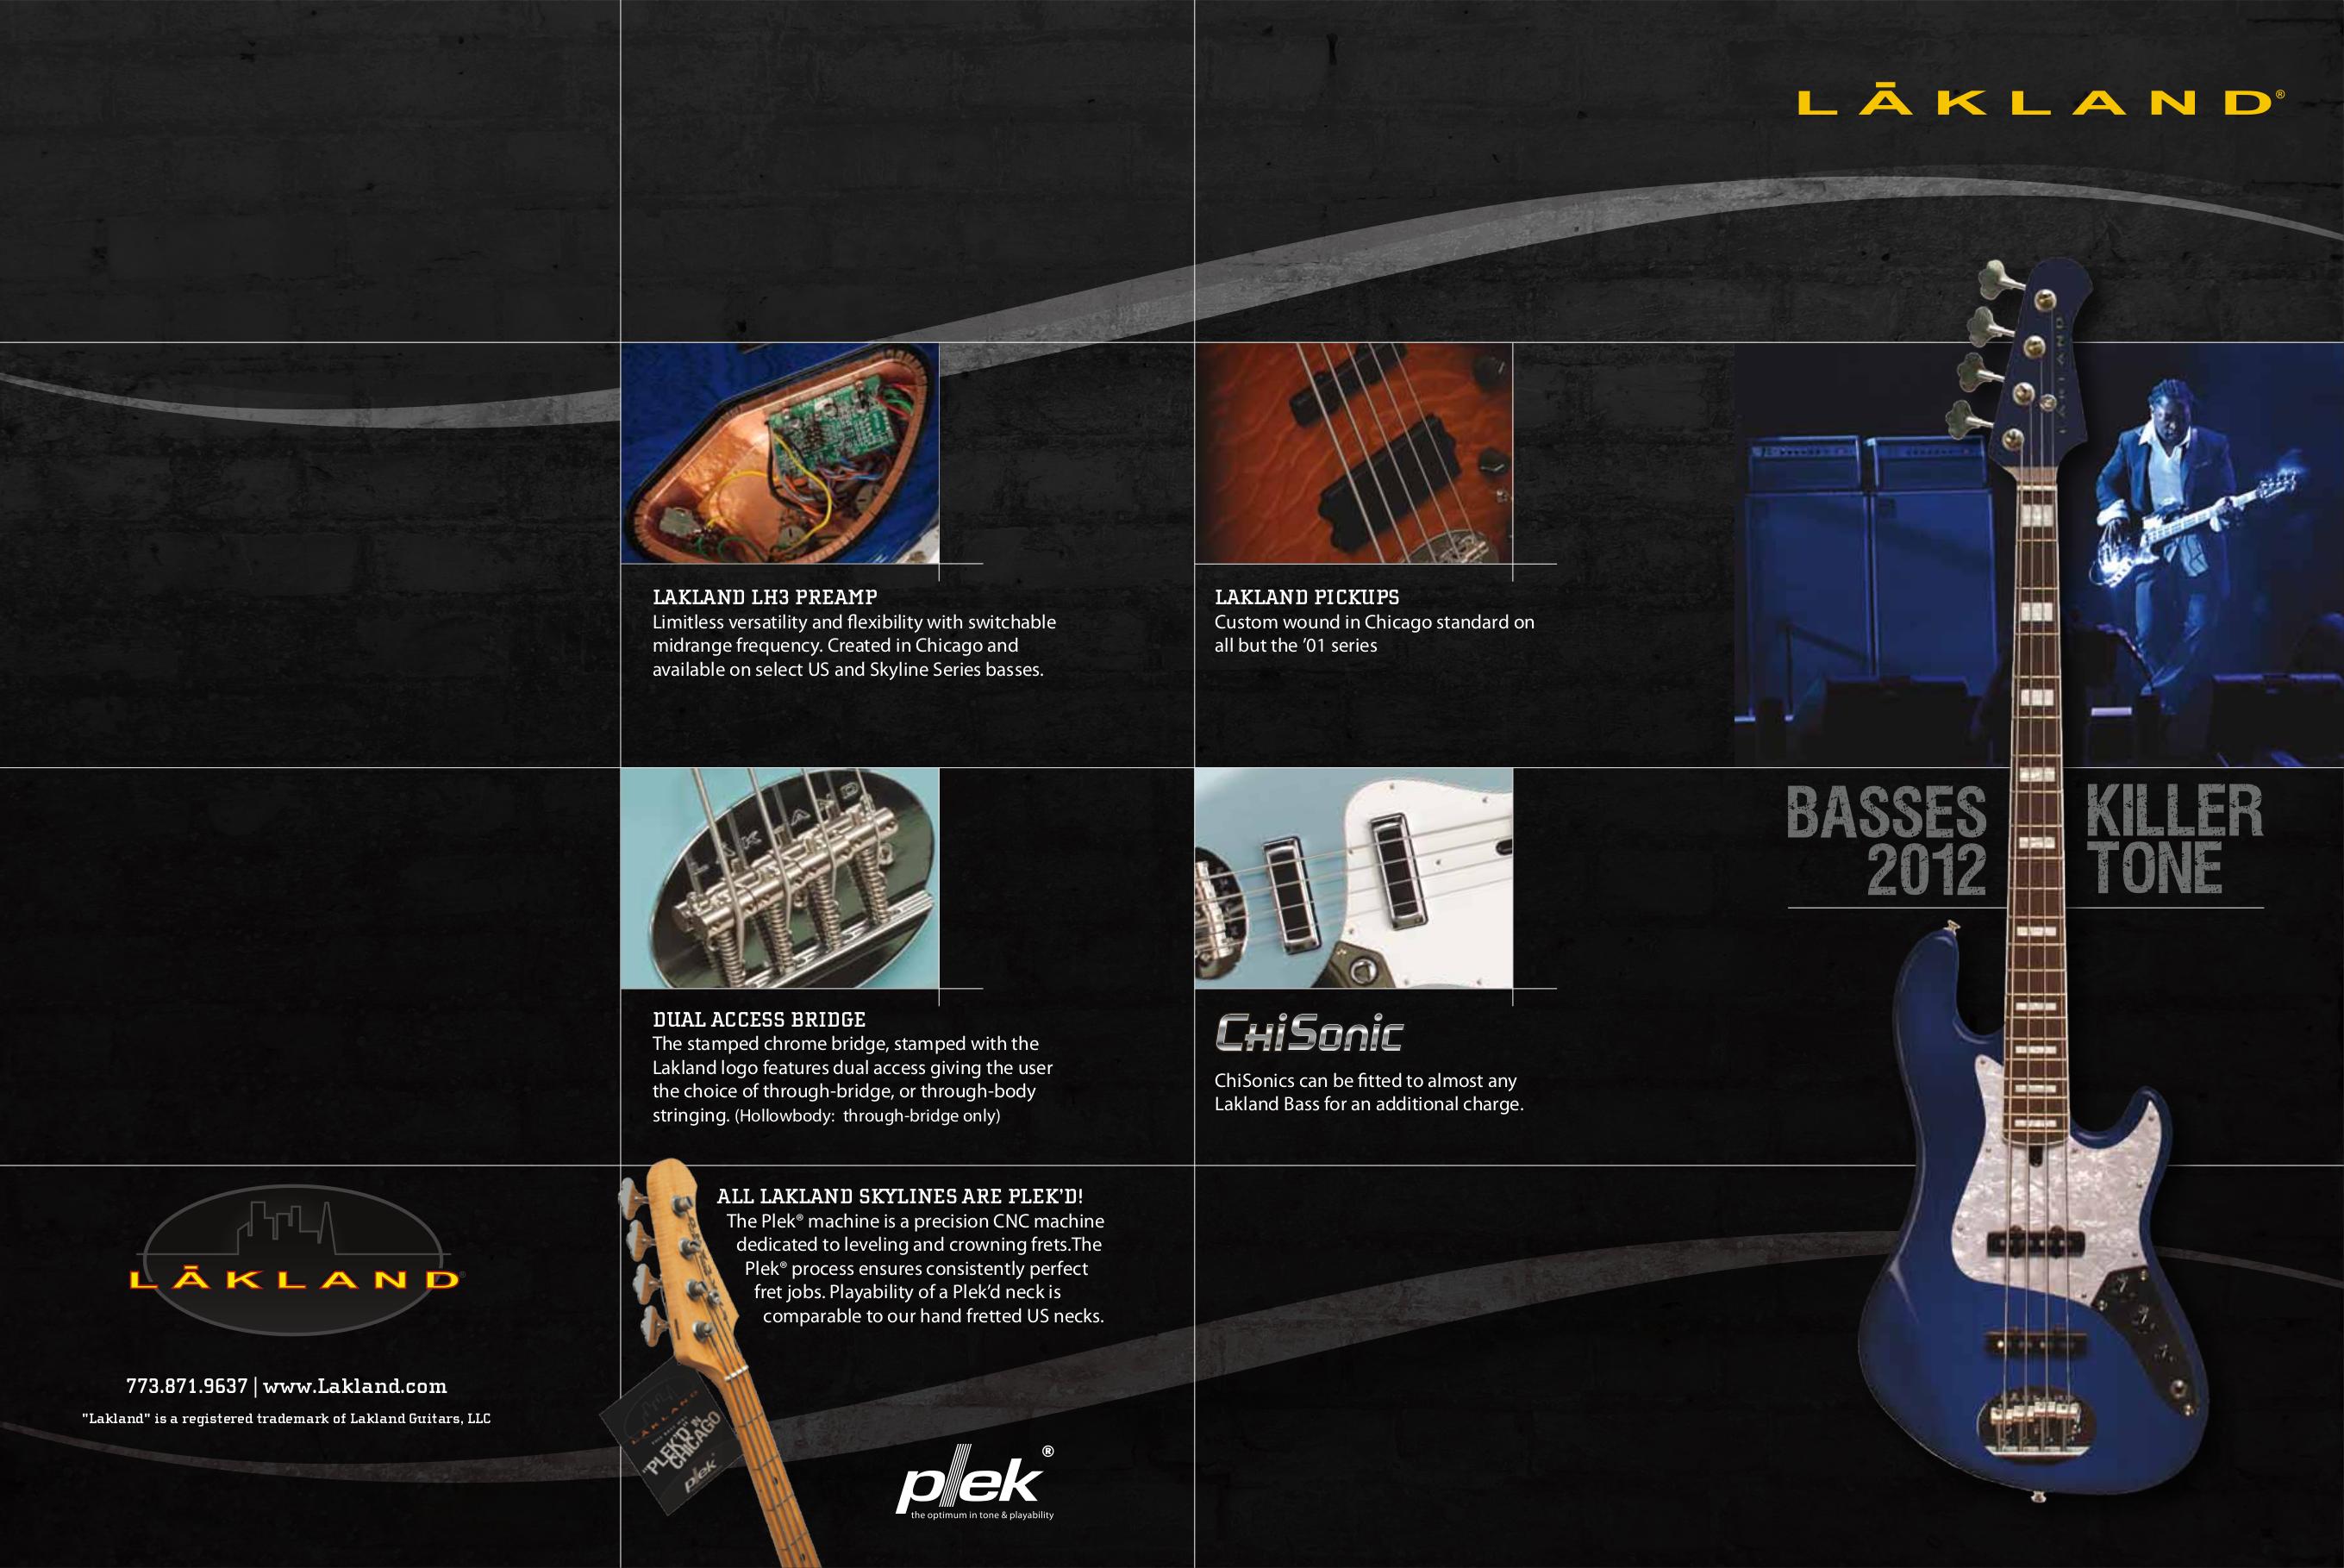 pdf for Lakland Guitar Skyline 55-01 manual